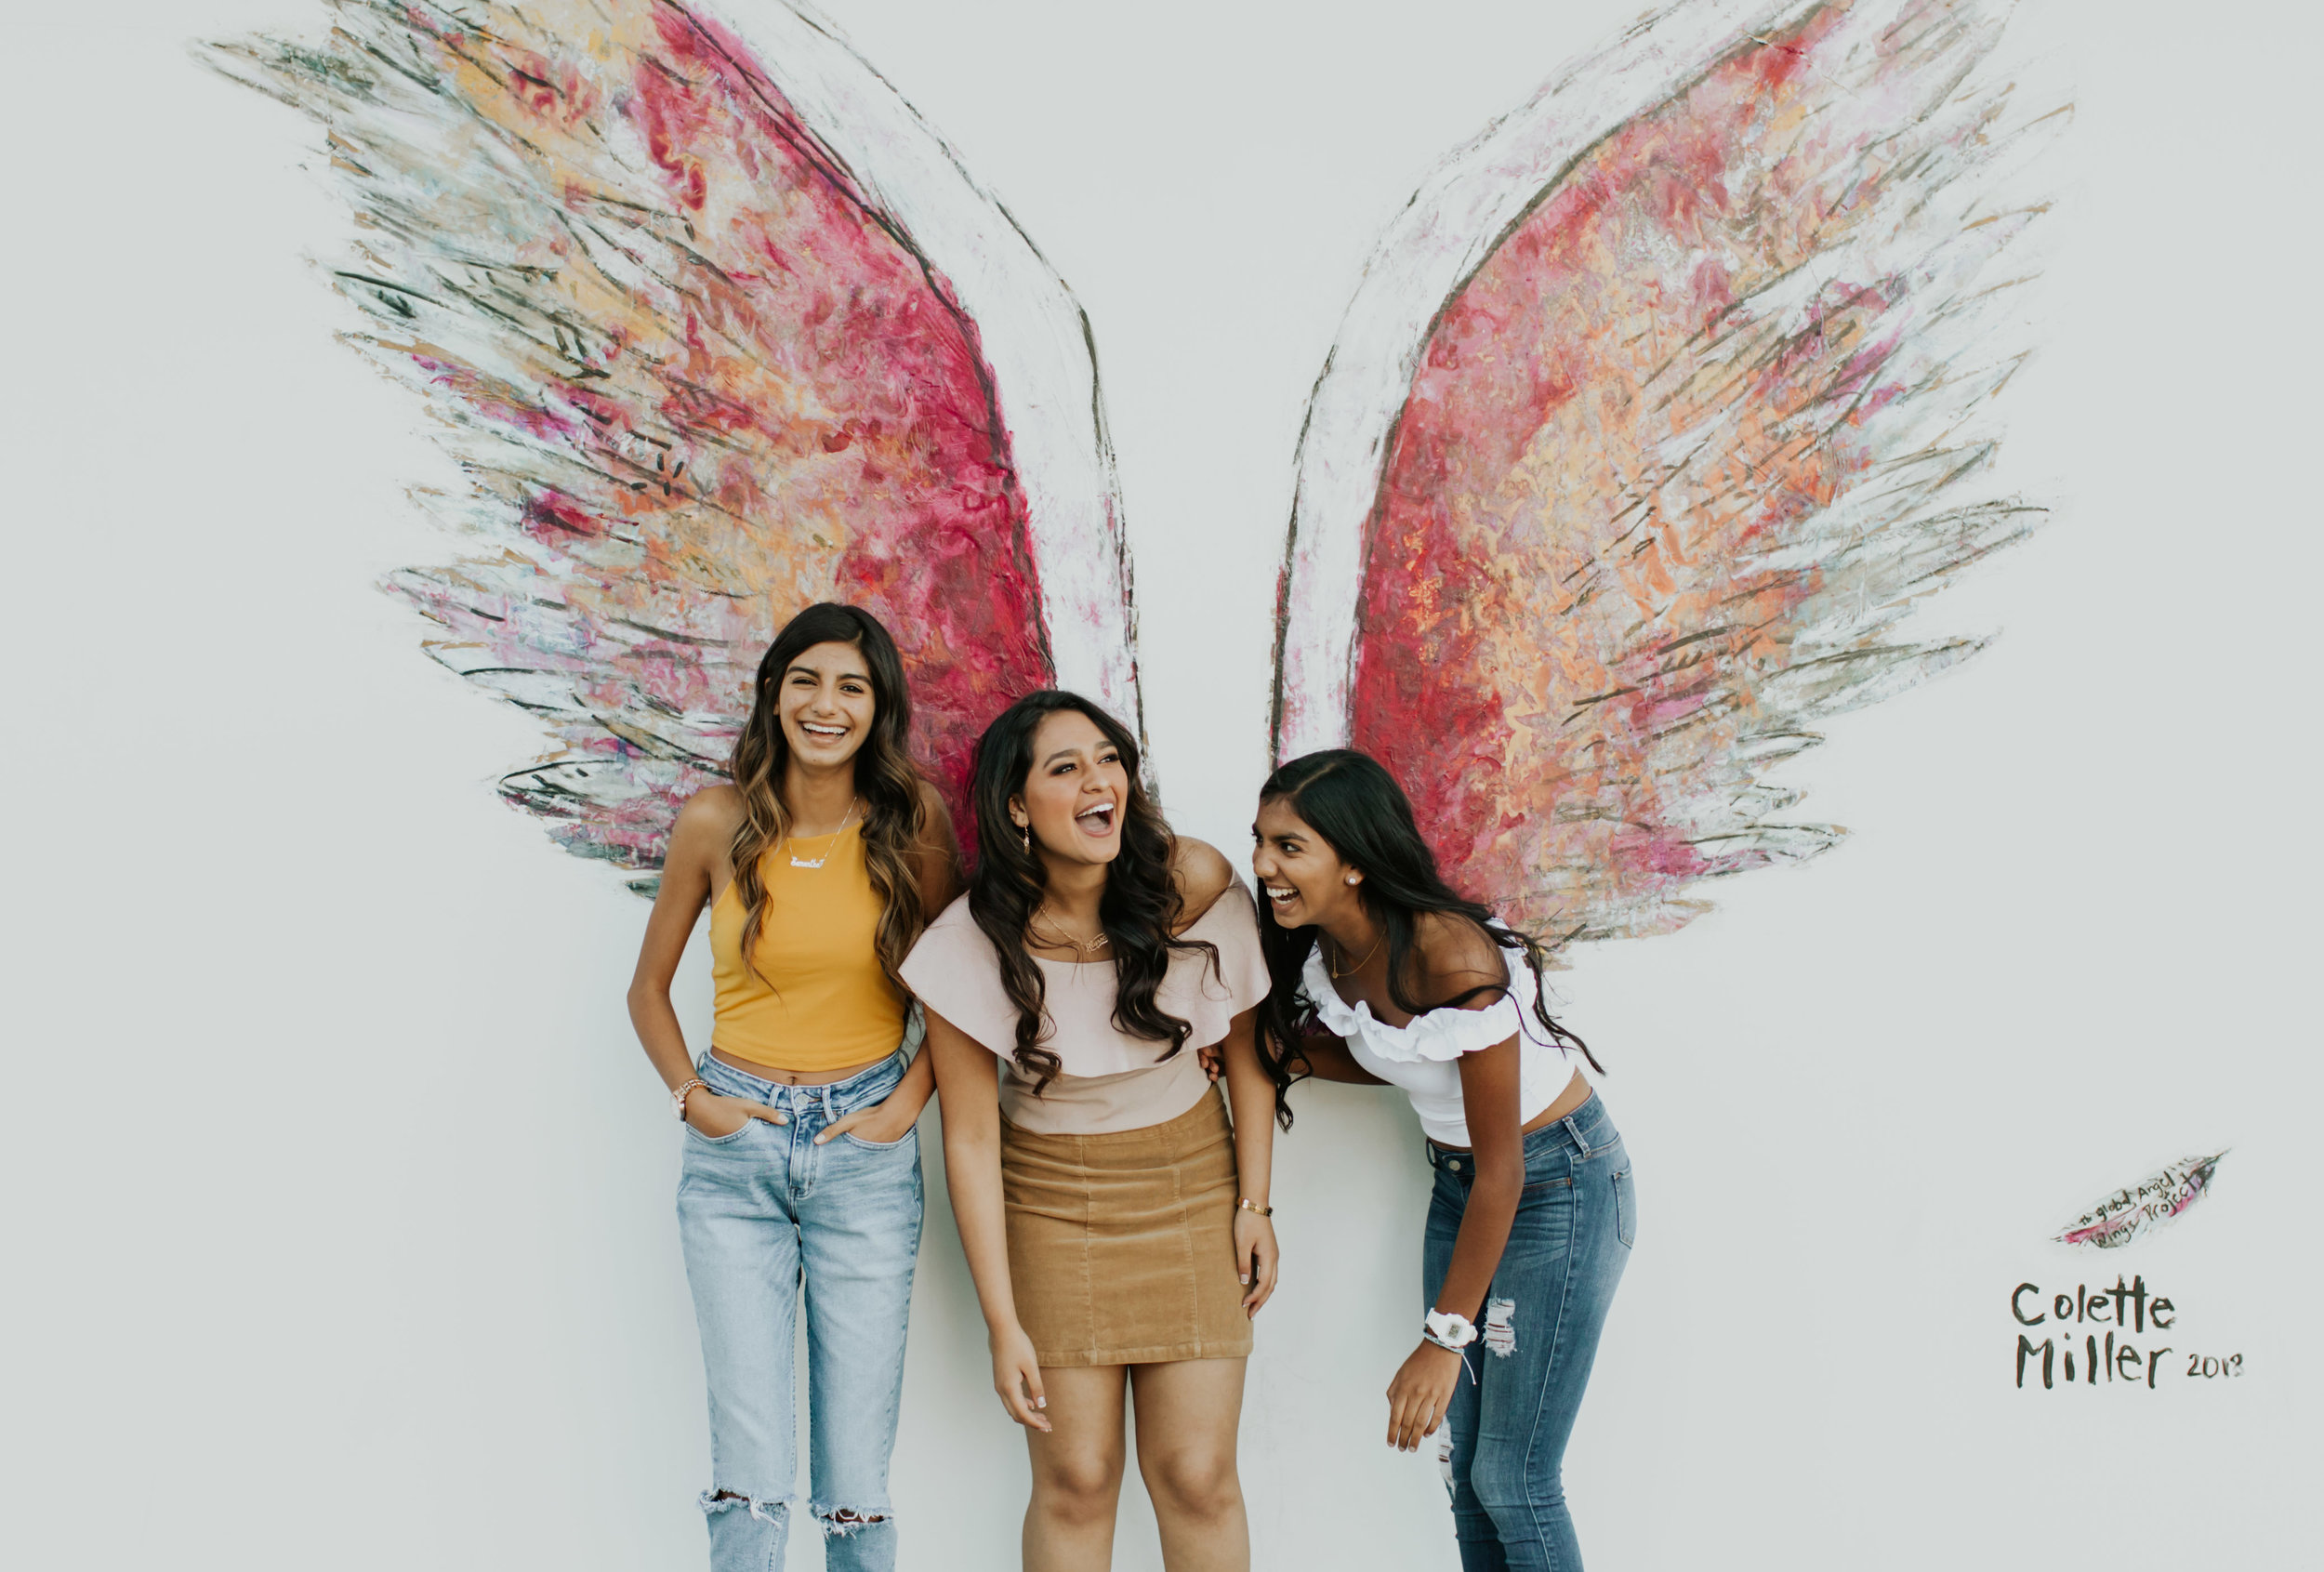 Alyssa | Raghu | Jacq and Jack | bonjour Nona | Lake Nona Social | Tavistock | The global angel wings project | Colette Miller | Vanessa Boy (95 of 57).jpg